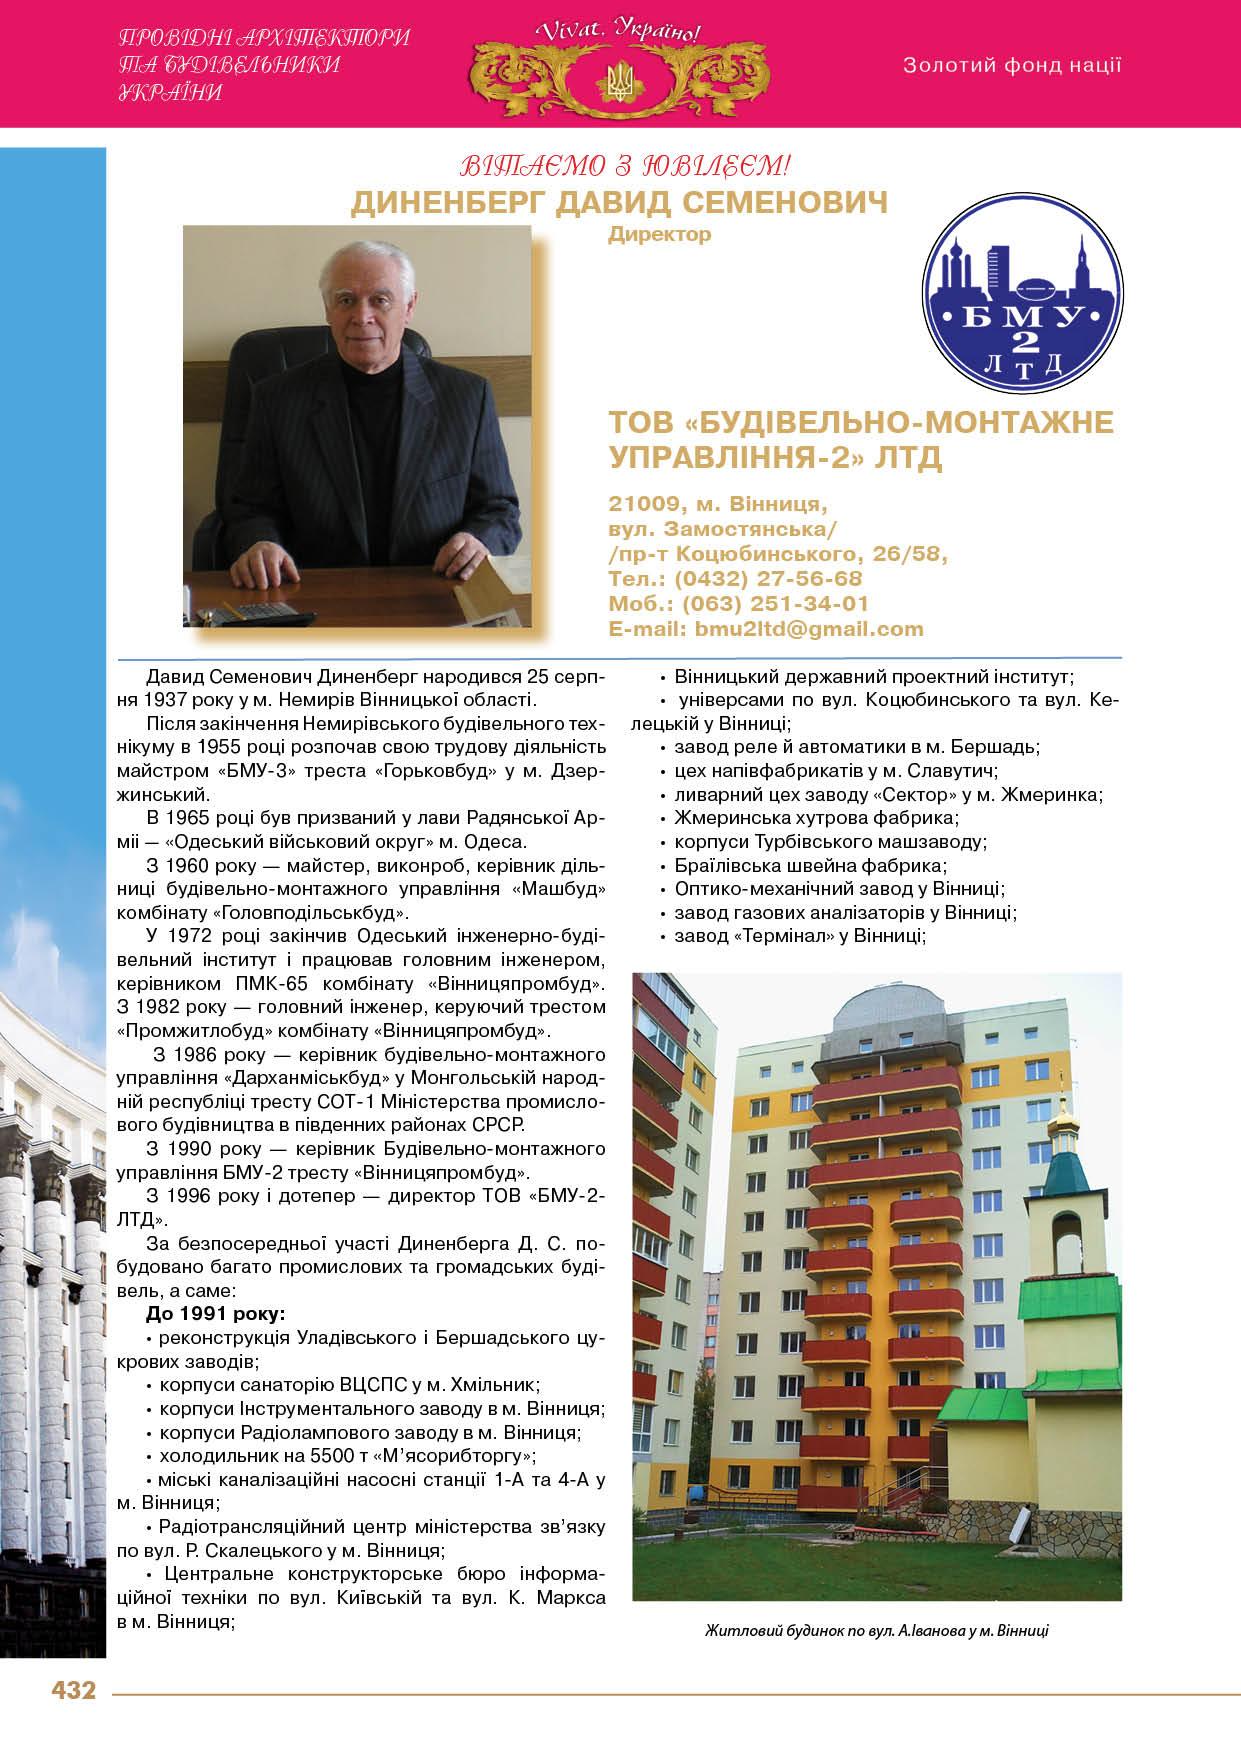 Диненберг Давид Семенович